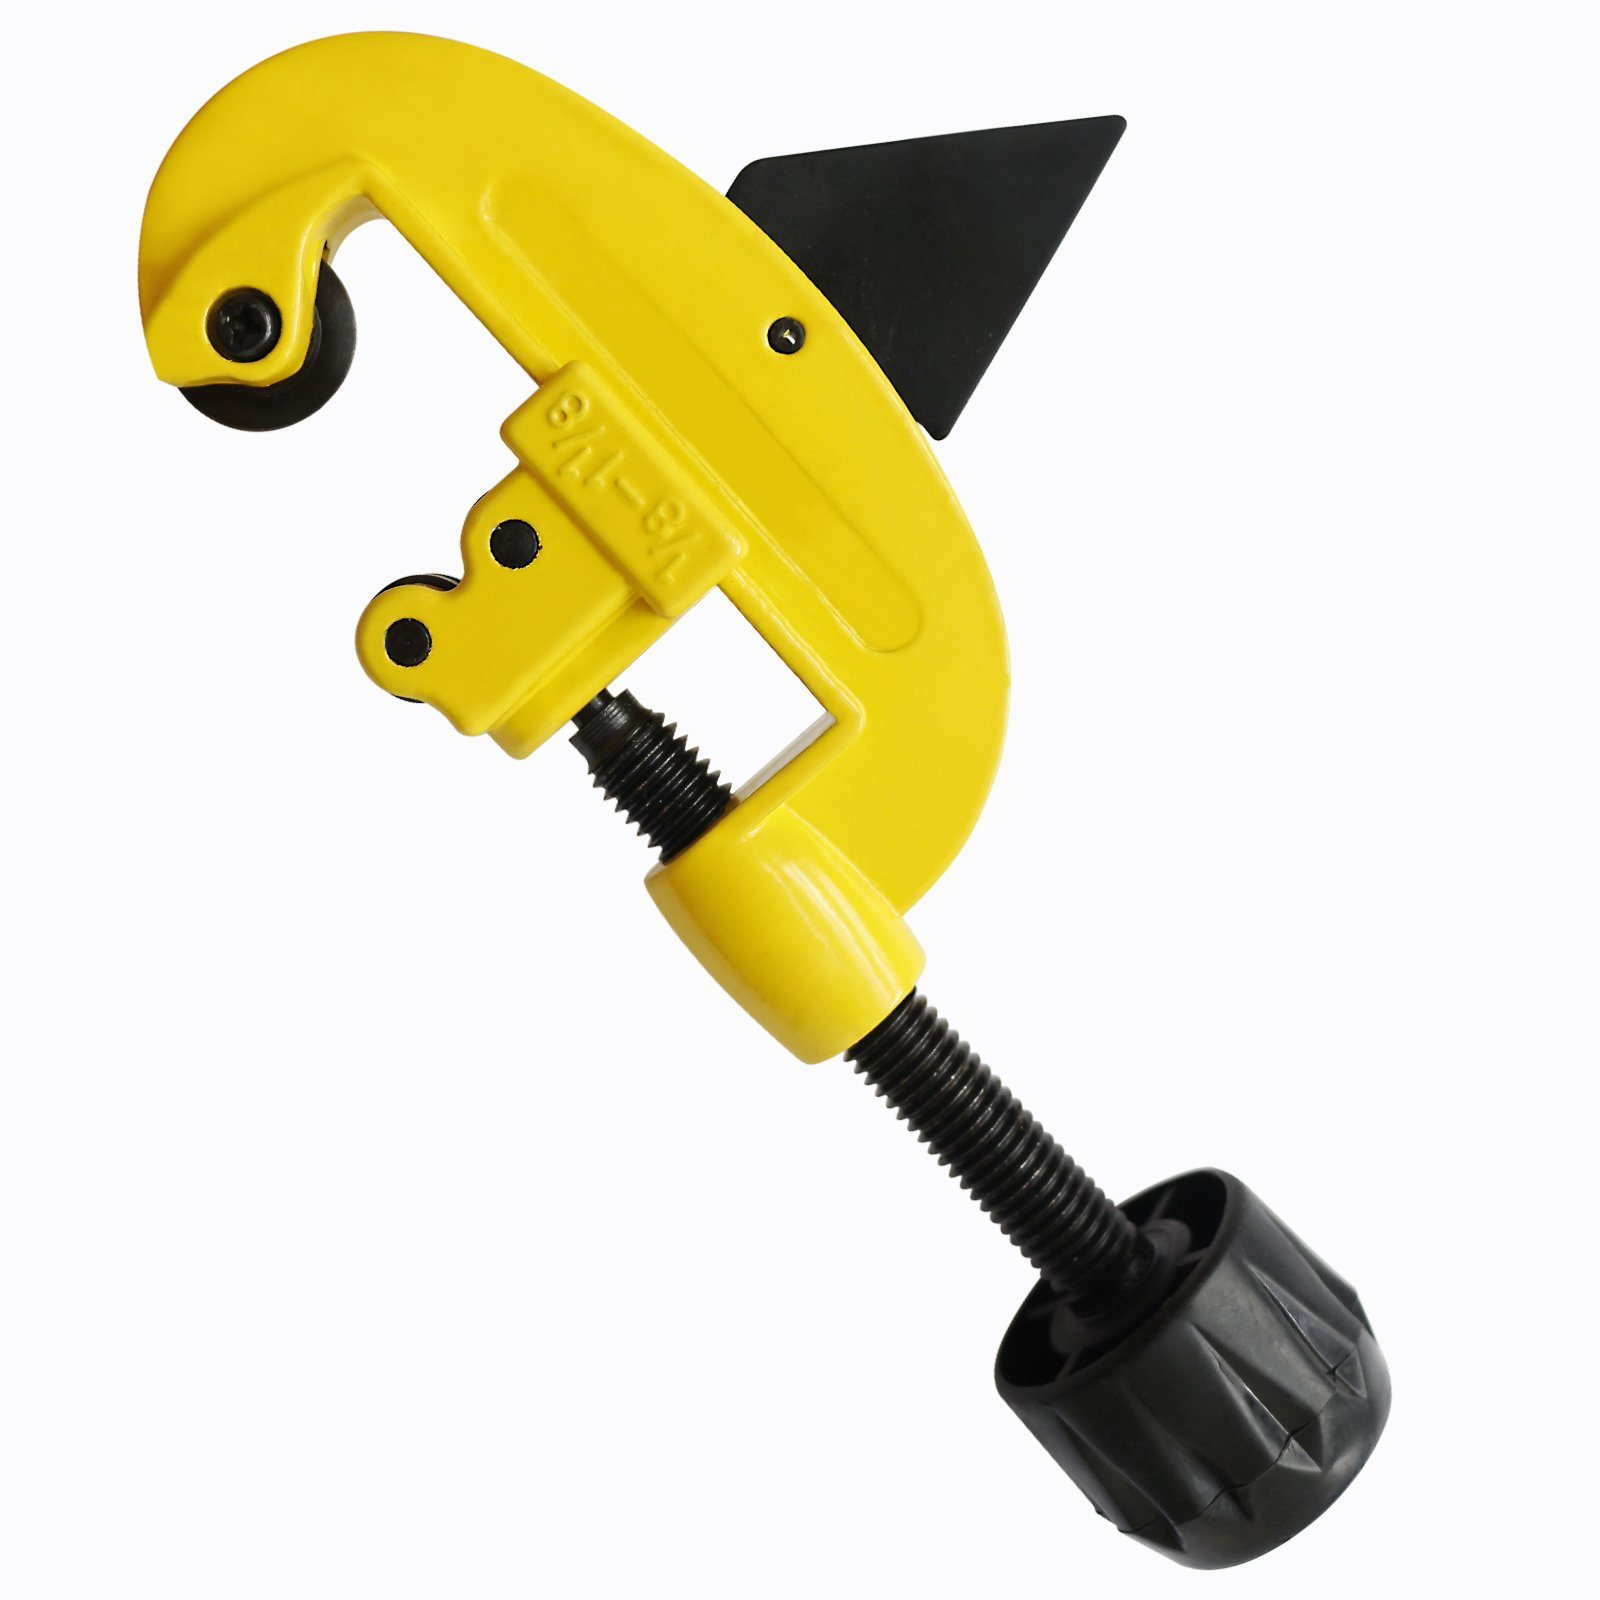 Cutting Tools Gcr15 Bearing Steel Metal Tube/Pipe Cutter